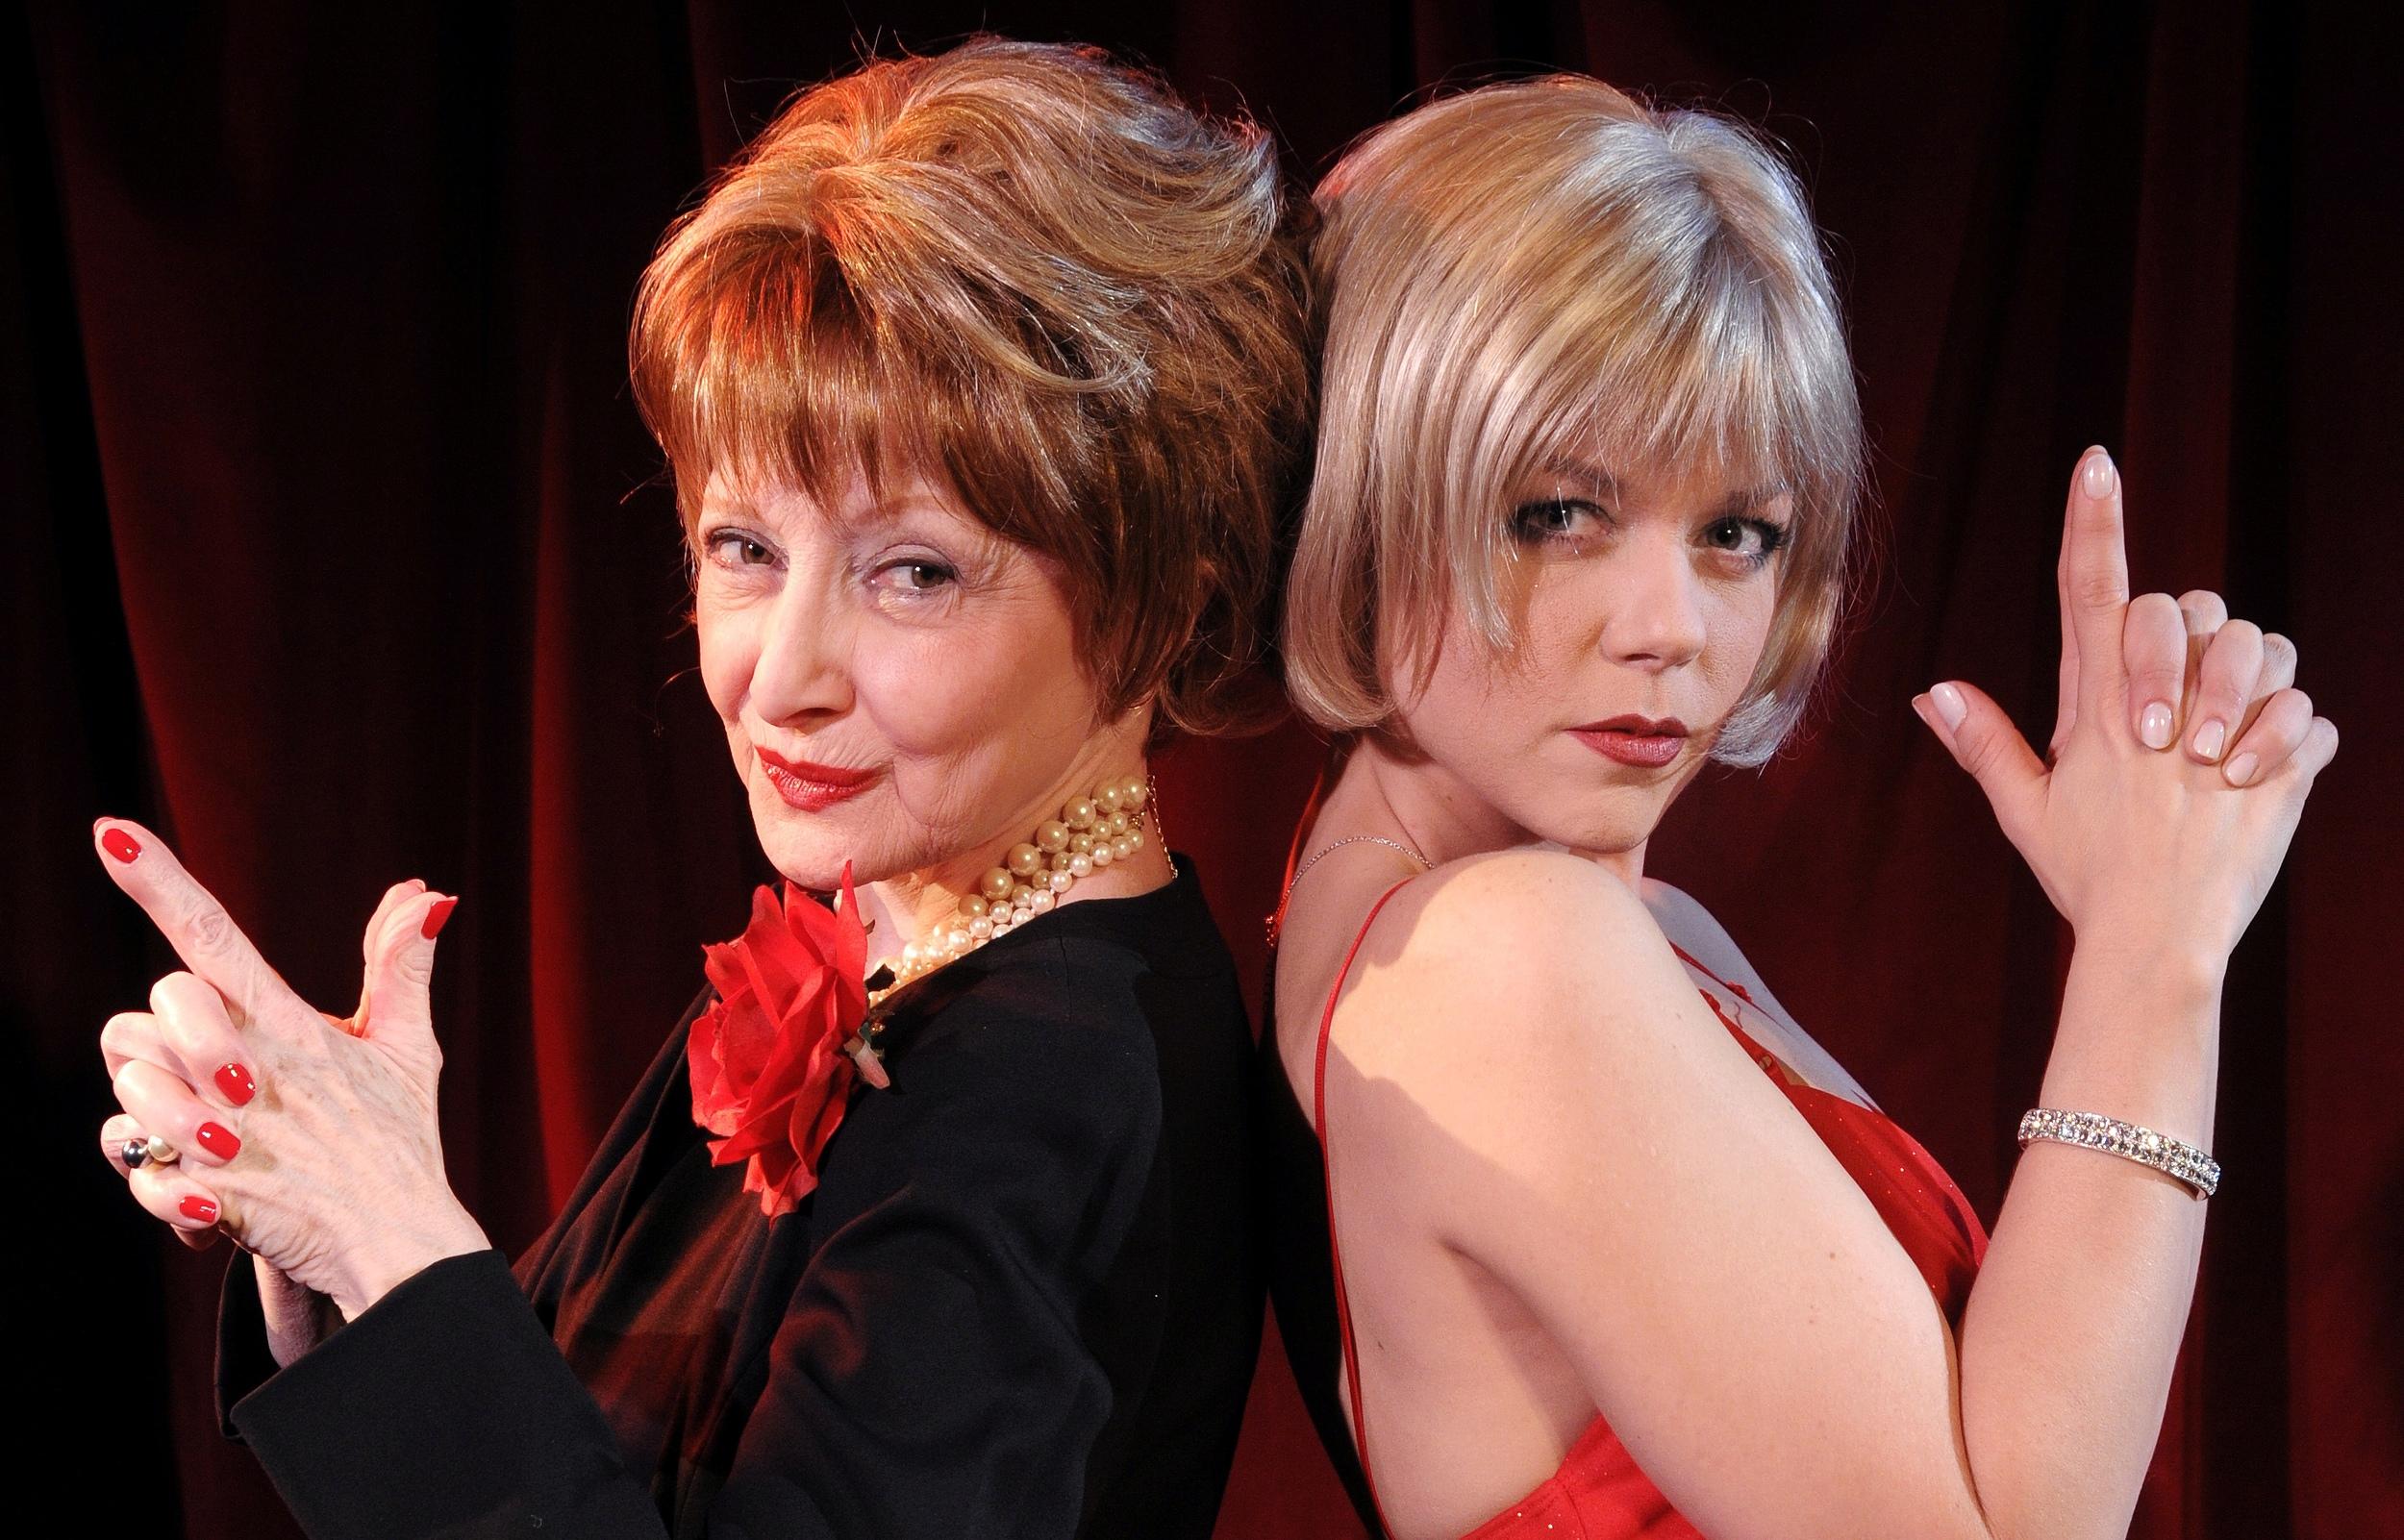 Marilyn Bernard as LIna, Jennifer Skura as Kitty